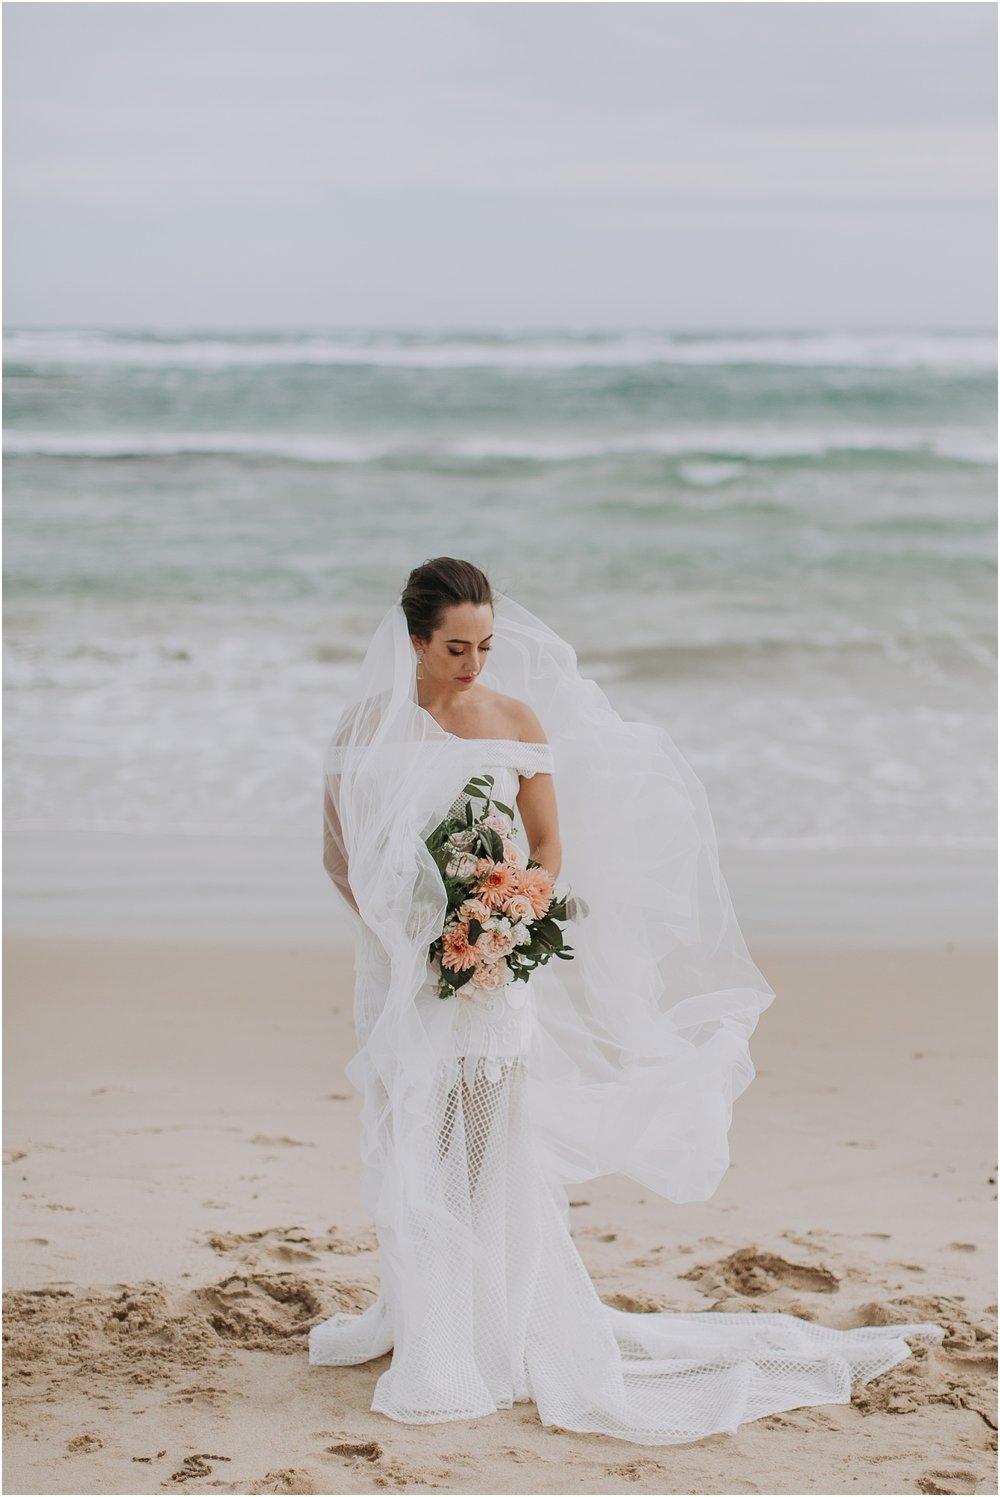 Kali and Simon's beach wedding at The Baths Sorrento on the Mornington Peninsula._0075.jpg